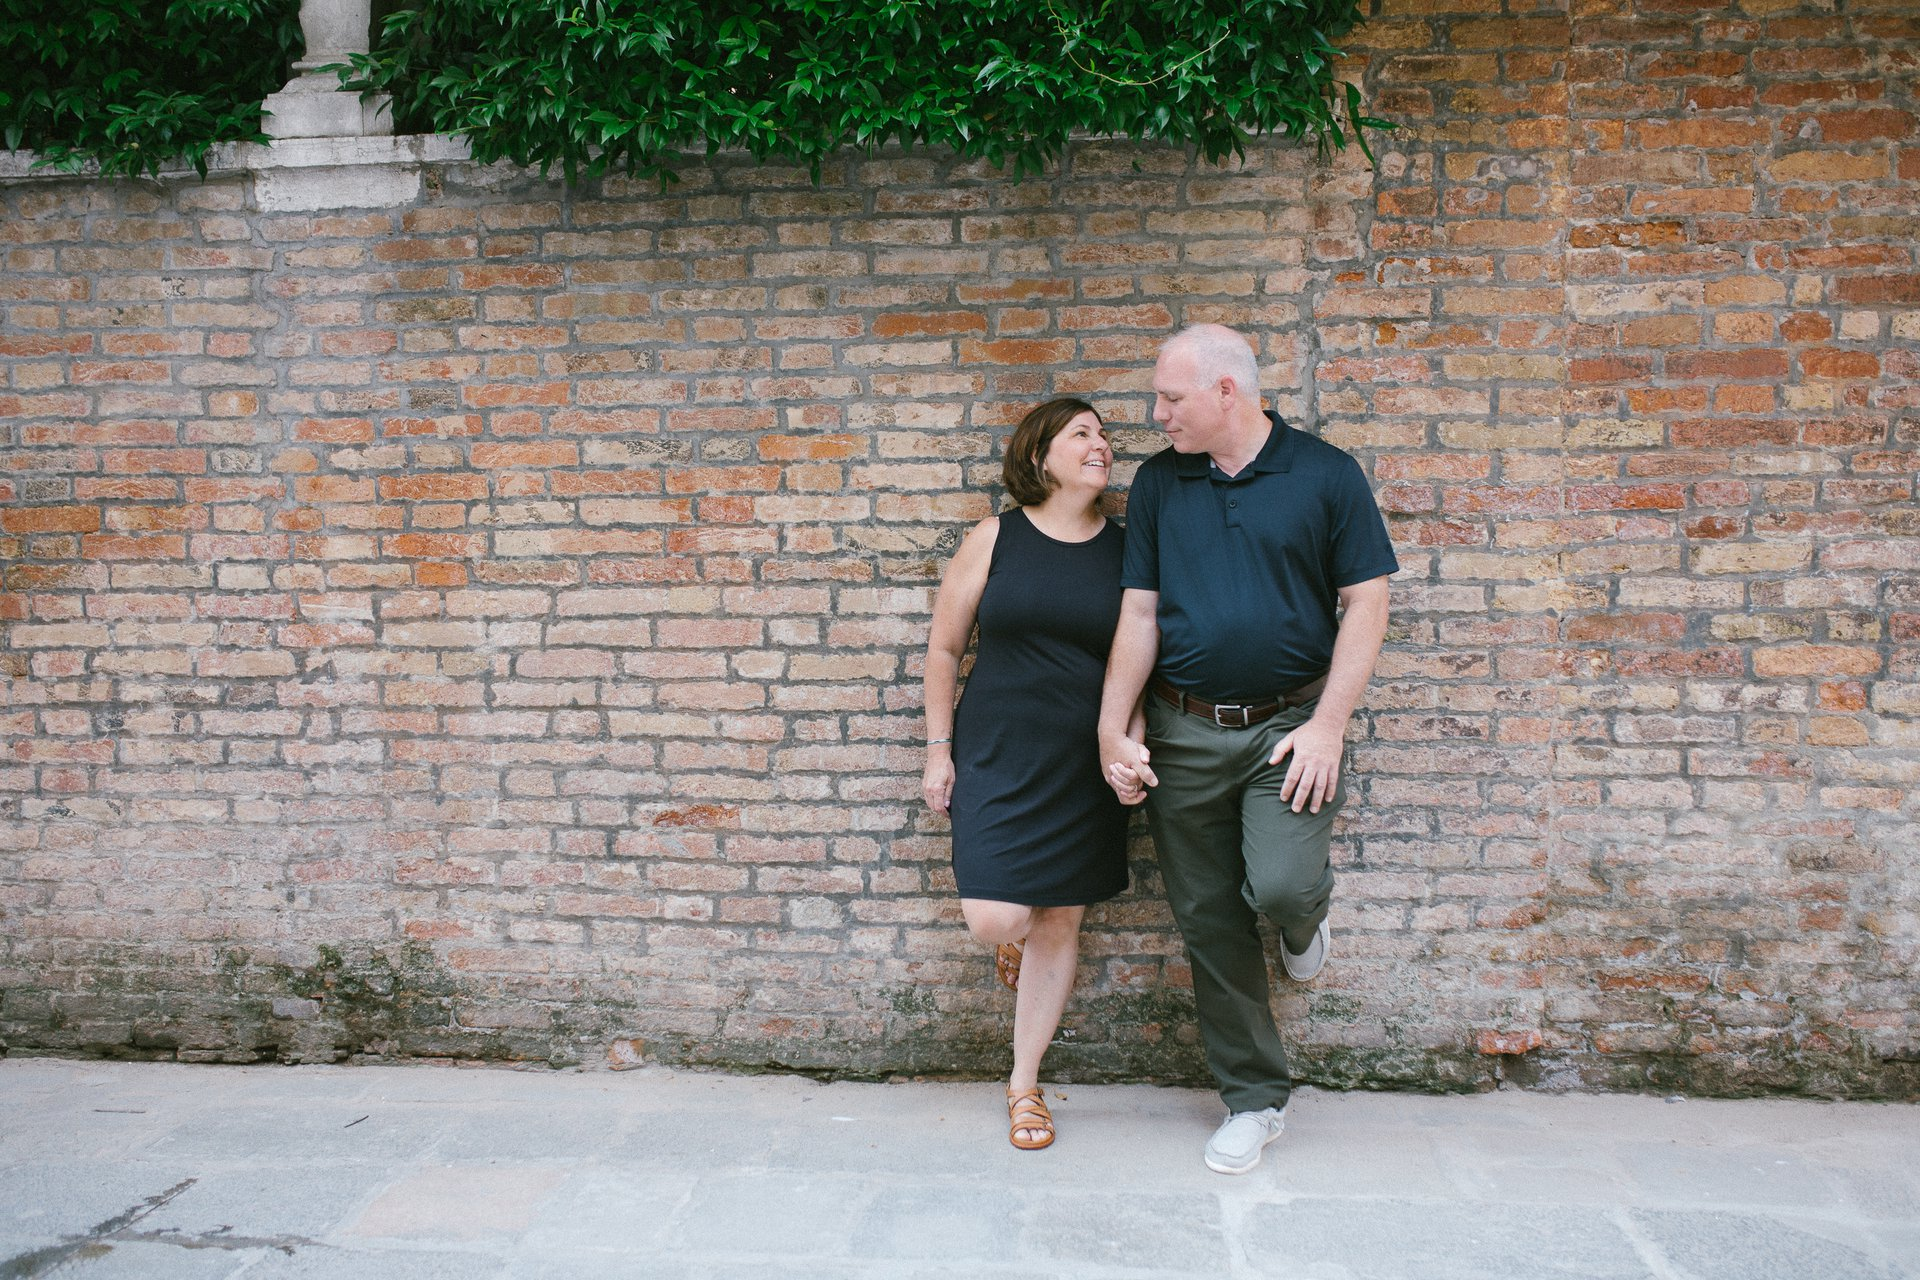 Venice-Italy-travel-story-Flytographer-27